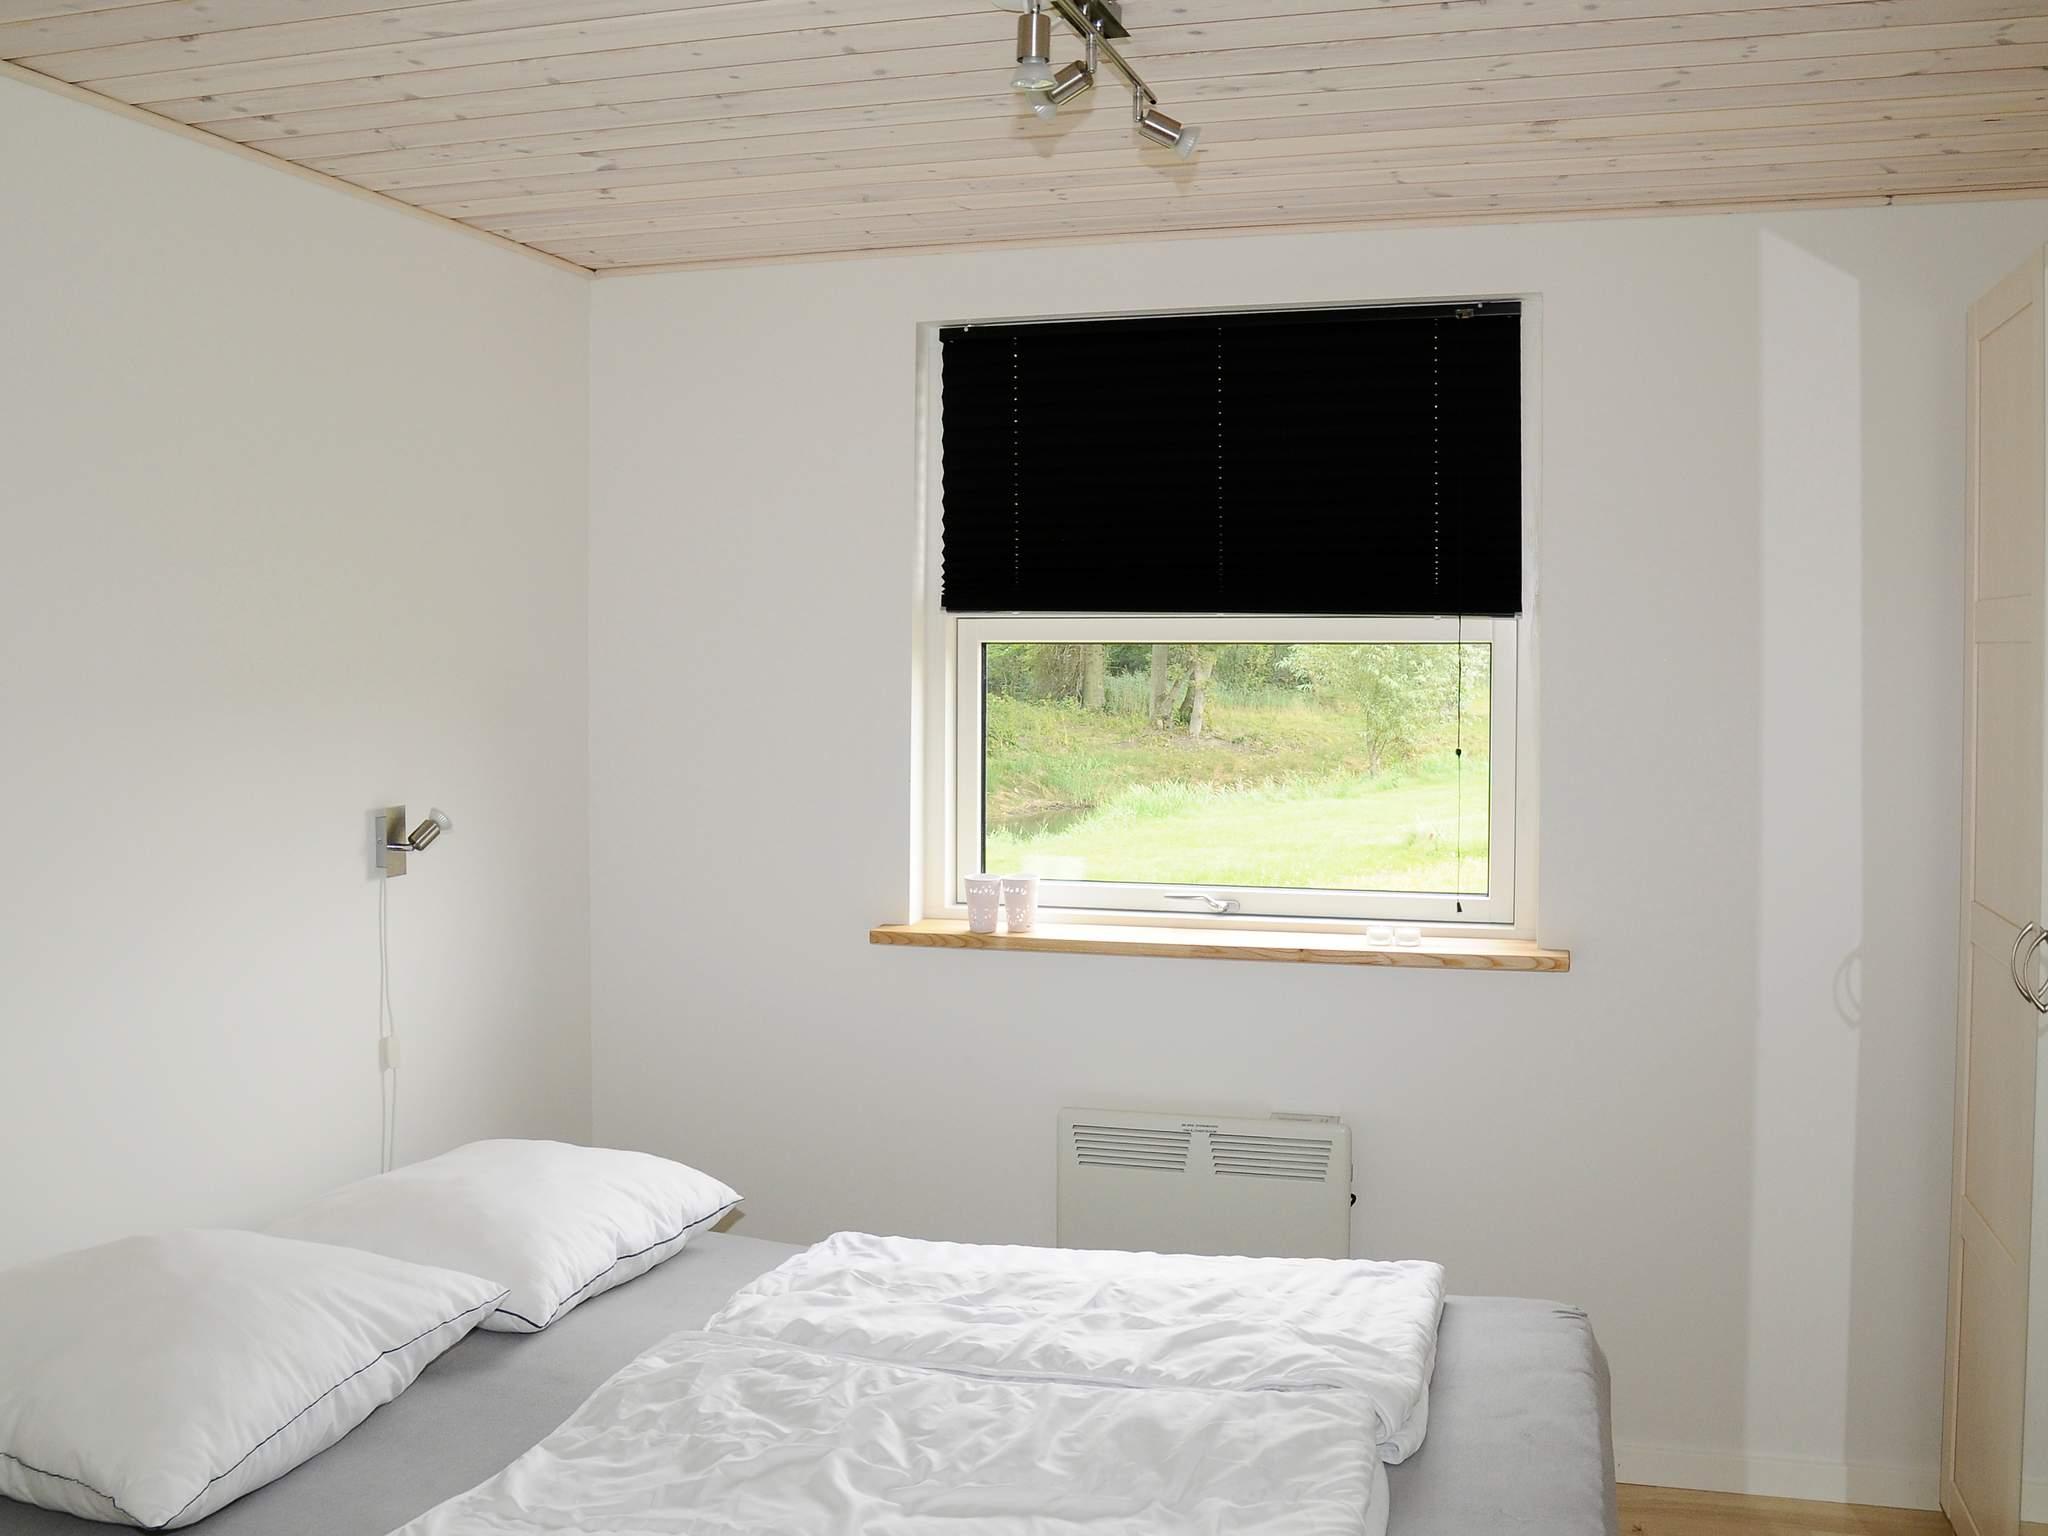 Ferienhaus Fjellerup Strand (336605), Fjellerup, , Ostjütland, Dänemark, Bild 8